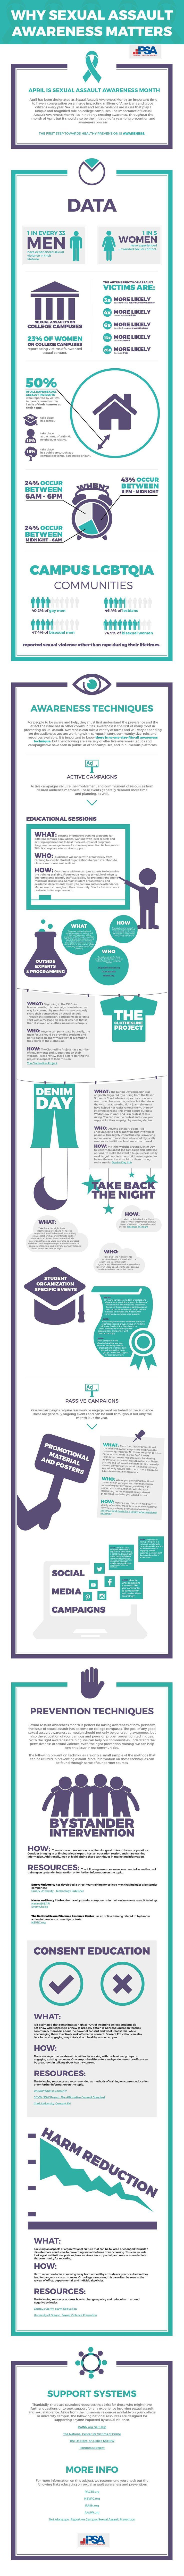 Why Sexual Assault Awareness Matters | Infographic | PSA Worldwide